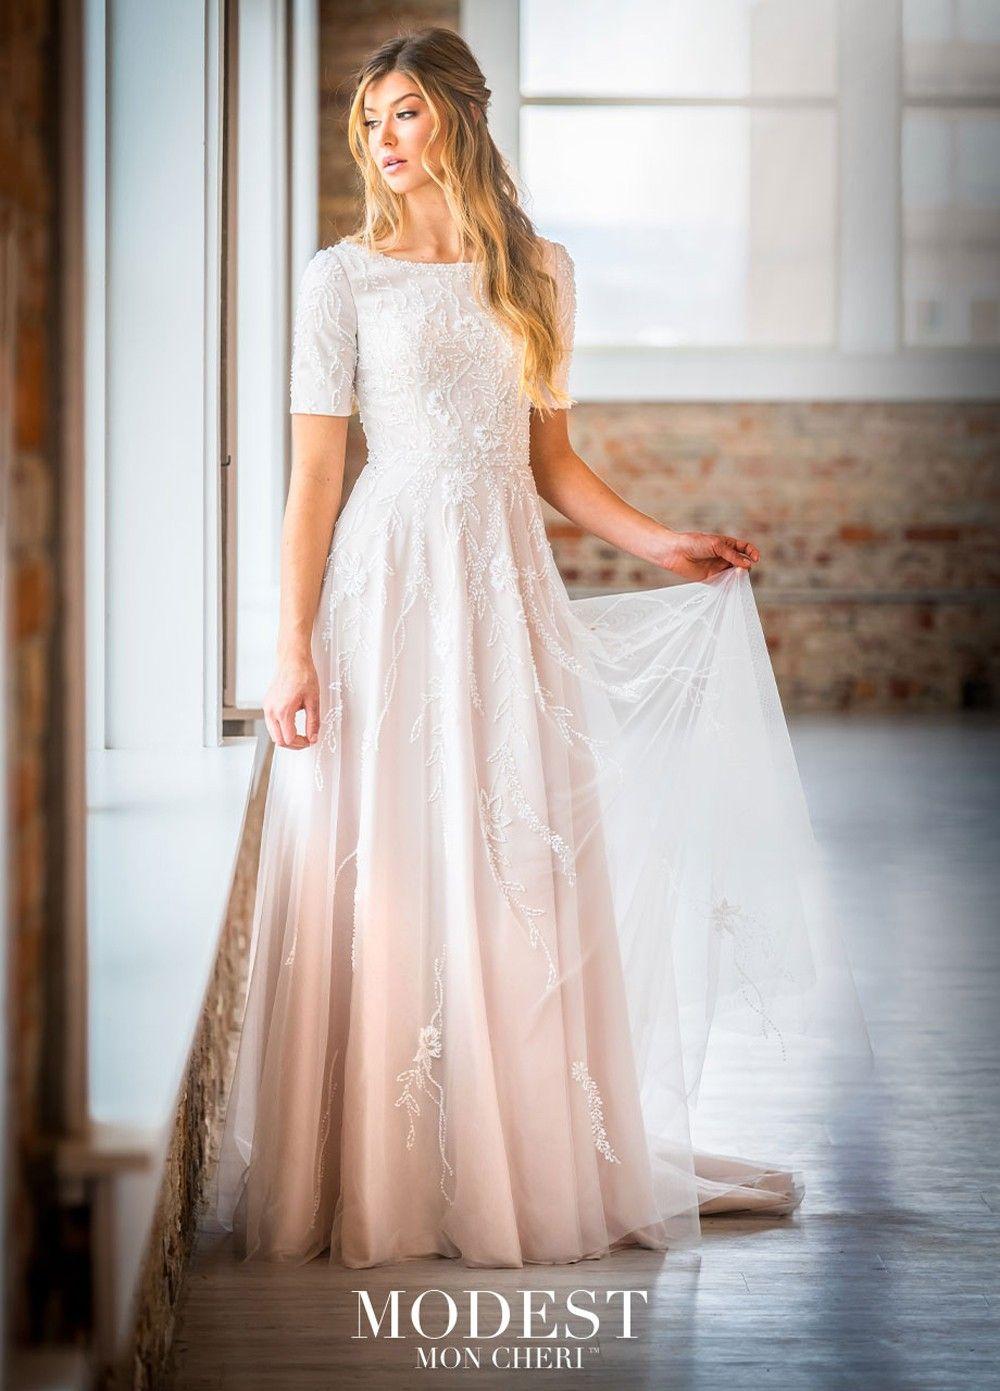 Pin By Deborah Sybrandy On Wedding Stuff In 2020 Short Sleeve Wedding Dress Pink Bridesmaid Dresses Dusty Pink Bridesmaid Dresses